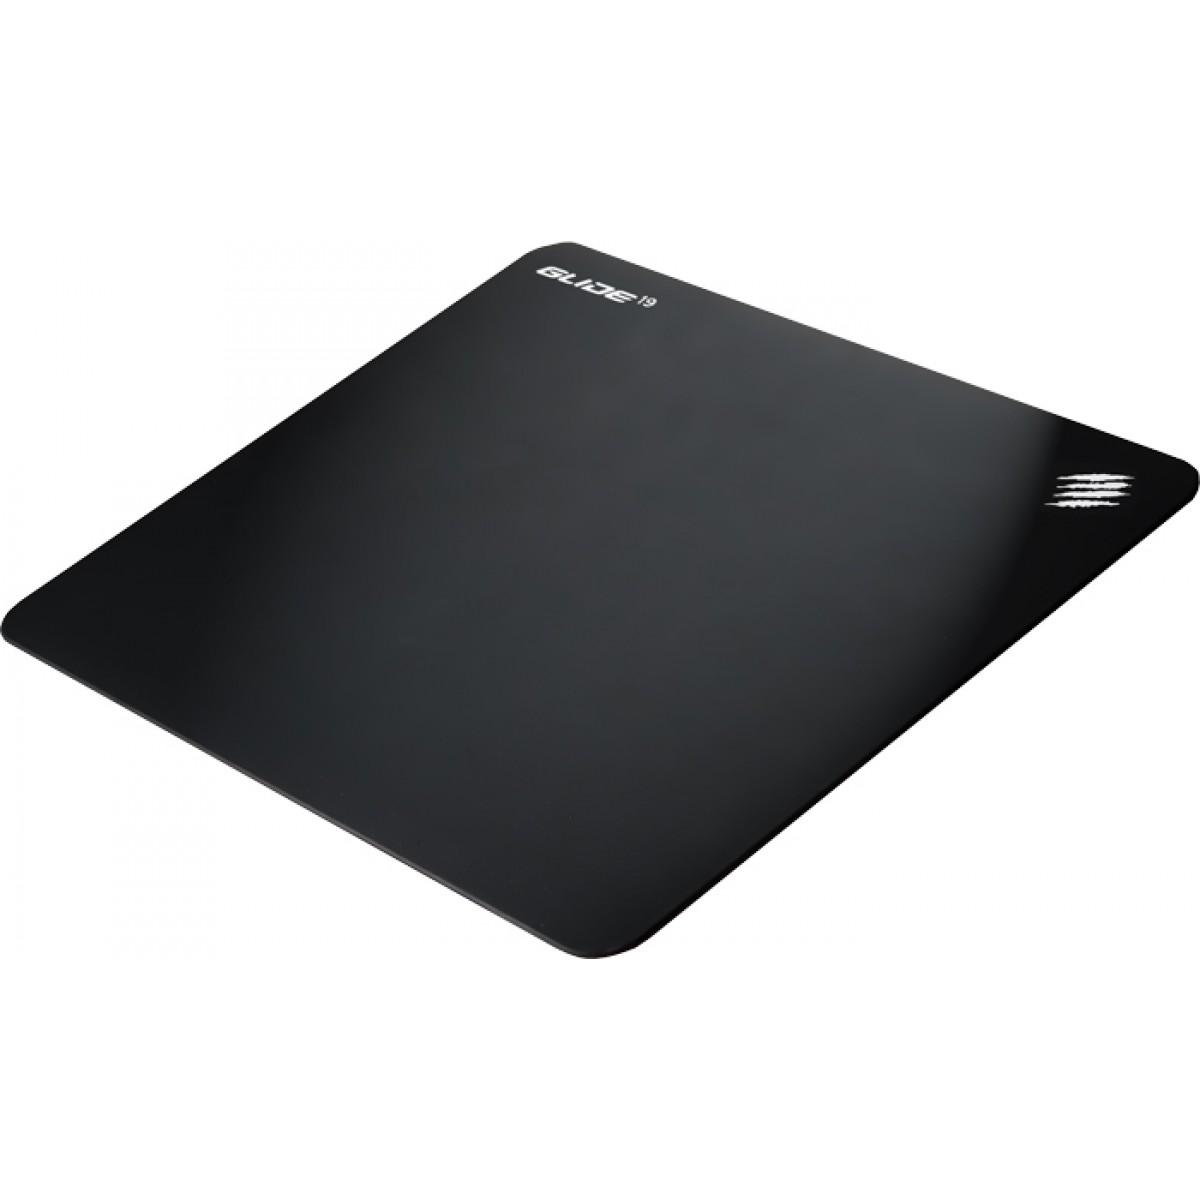 Mousepad Gamer Mad Catz Glide 19, Médio, Black, SGSSNS19BL01